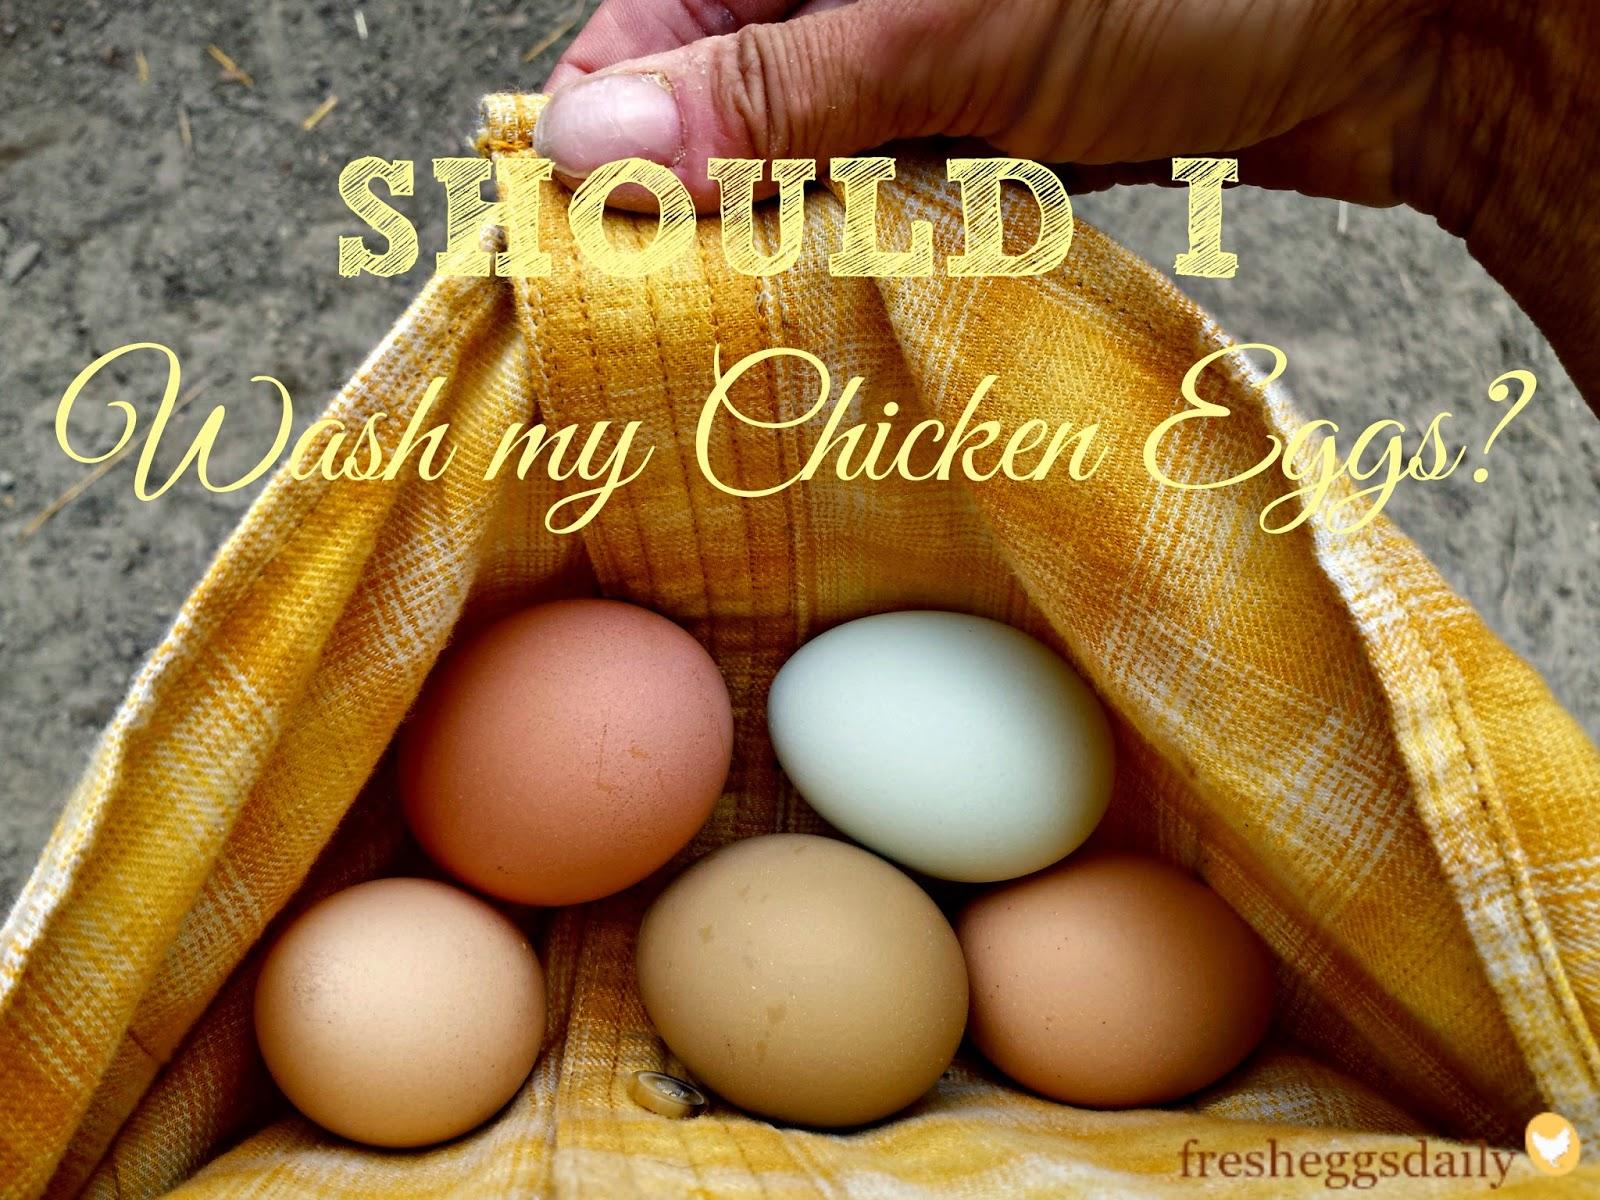 Should I Wash my Chicken Eggs?